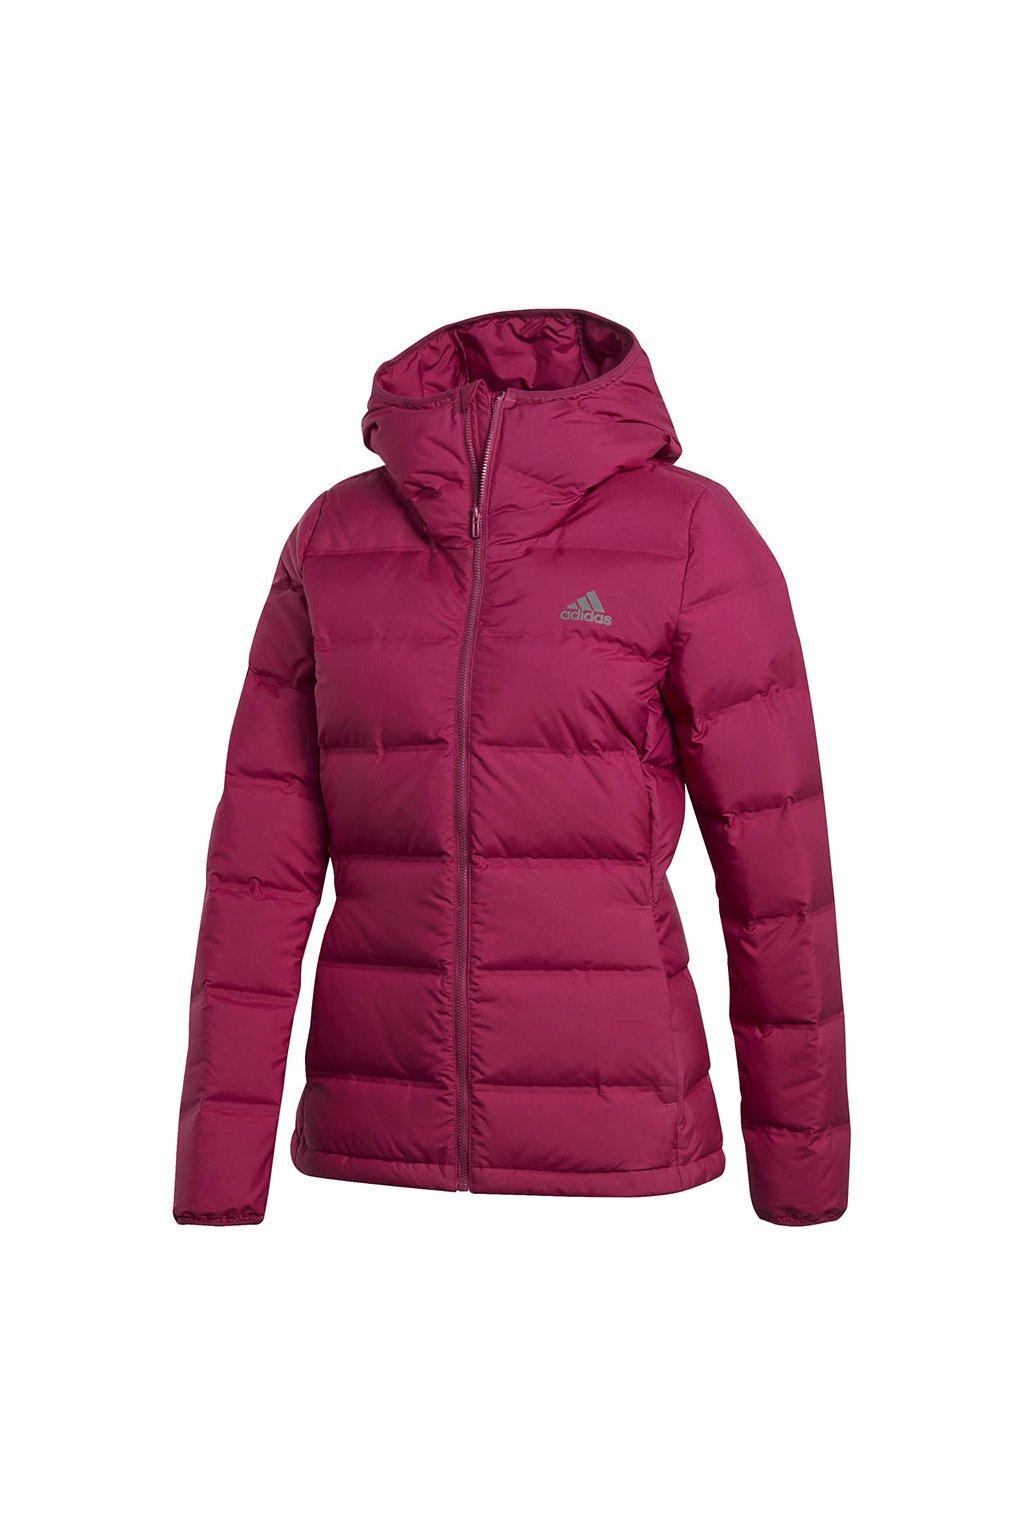 Dámska bunda adidas Helionic Down Hooded ružová GM5345